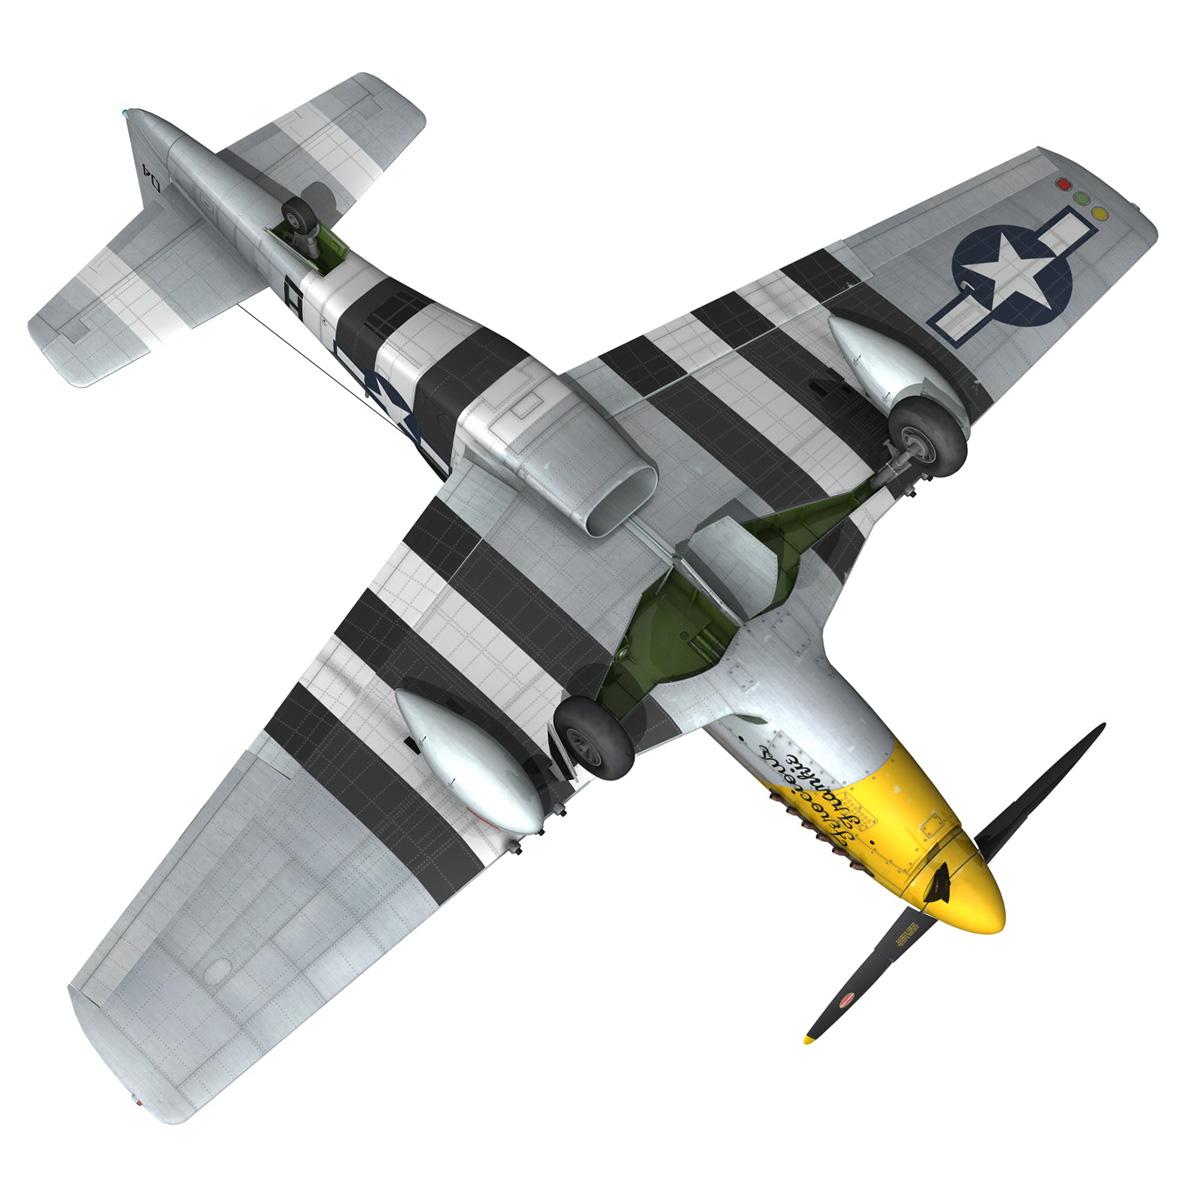 north american p-51d mustang – ferocious frankie 3d model fbx c4d lwo obj 269502